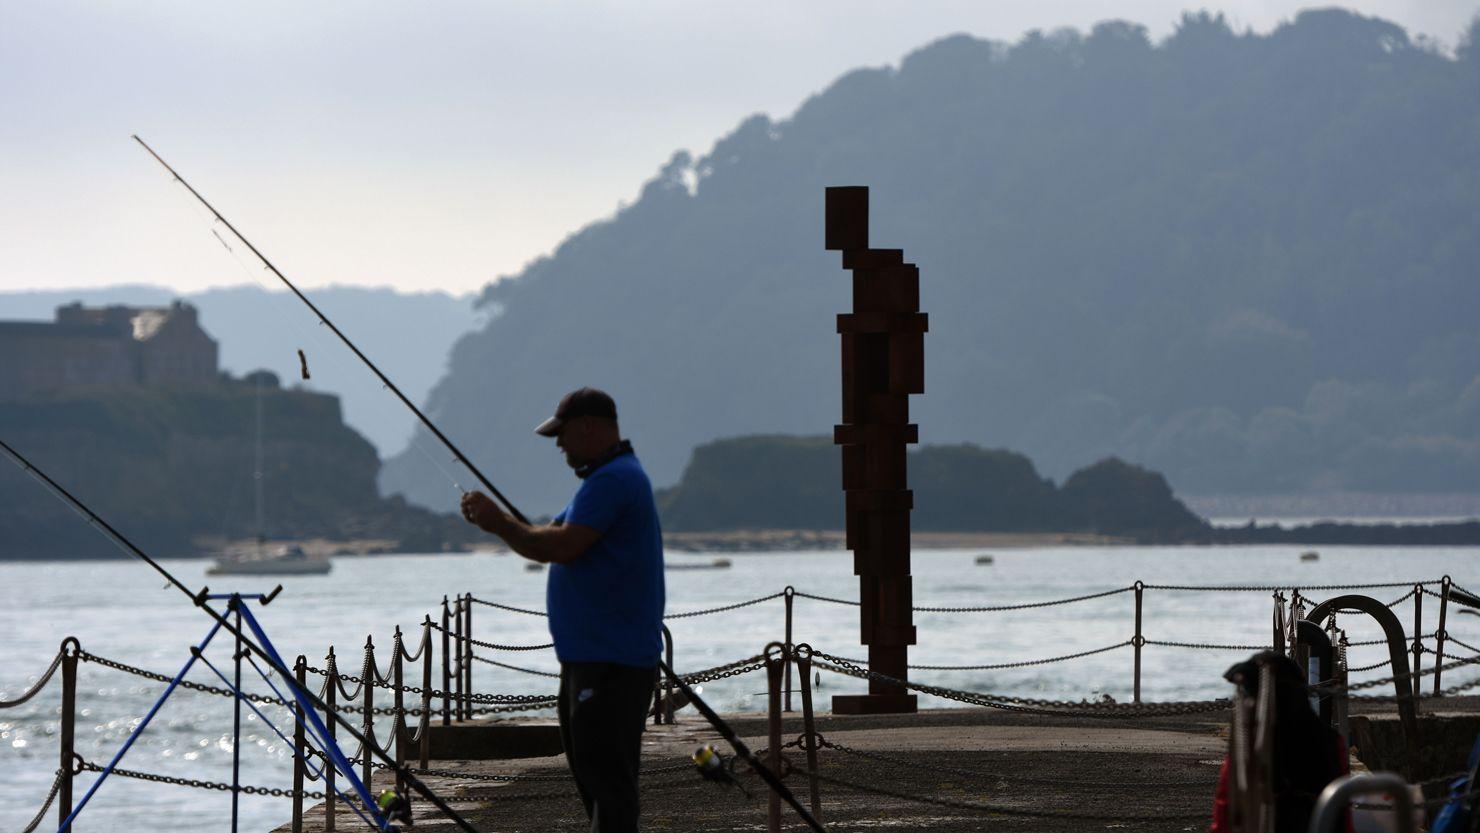 Look II - West Hoe Pier sculpture + fisherman, September 2020